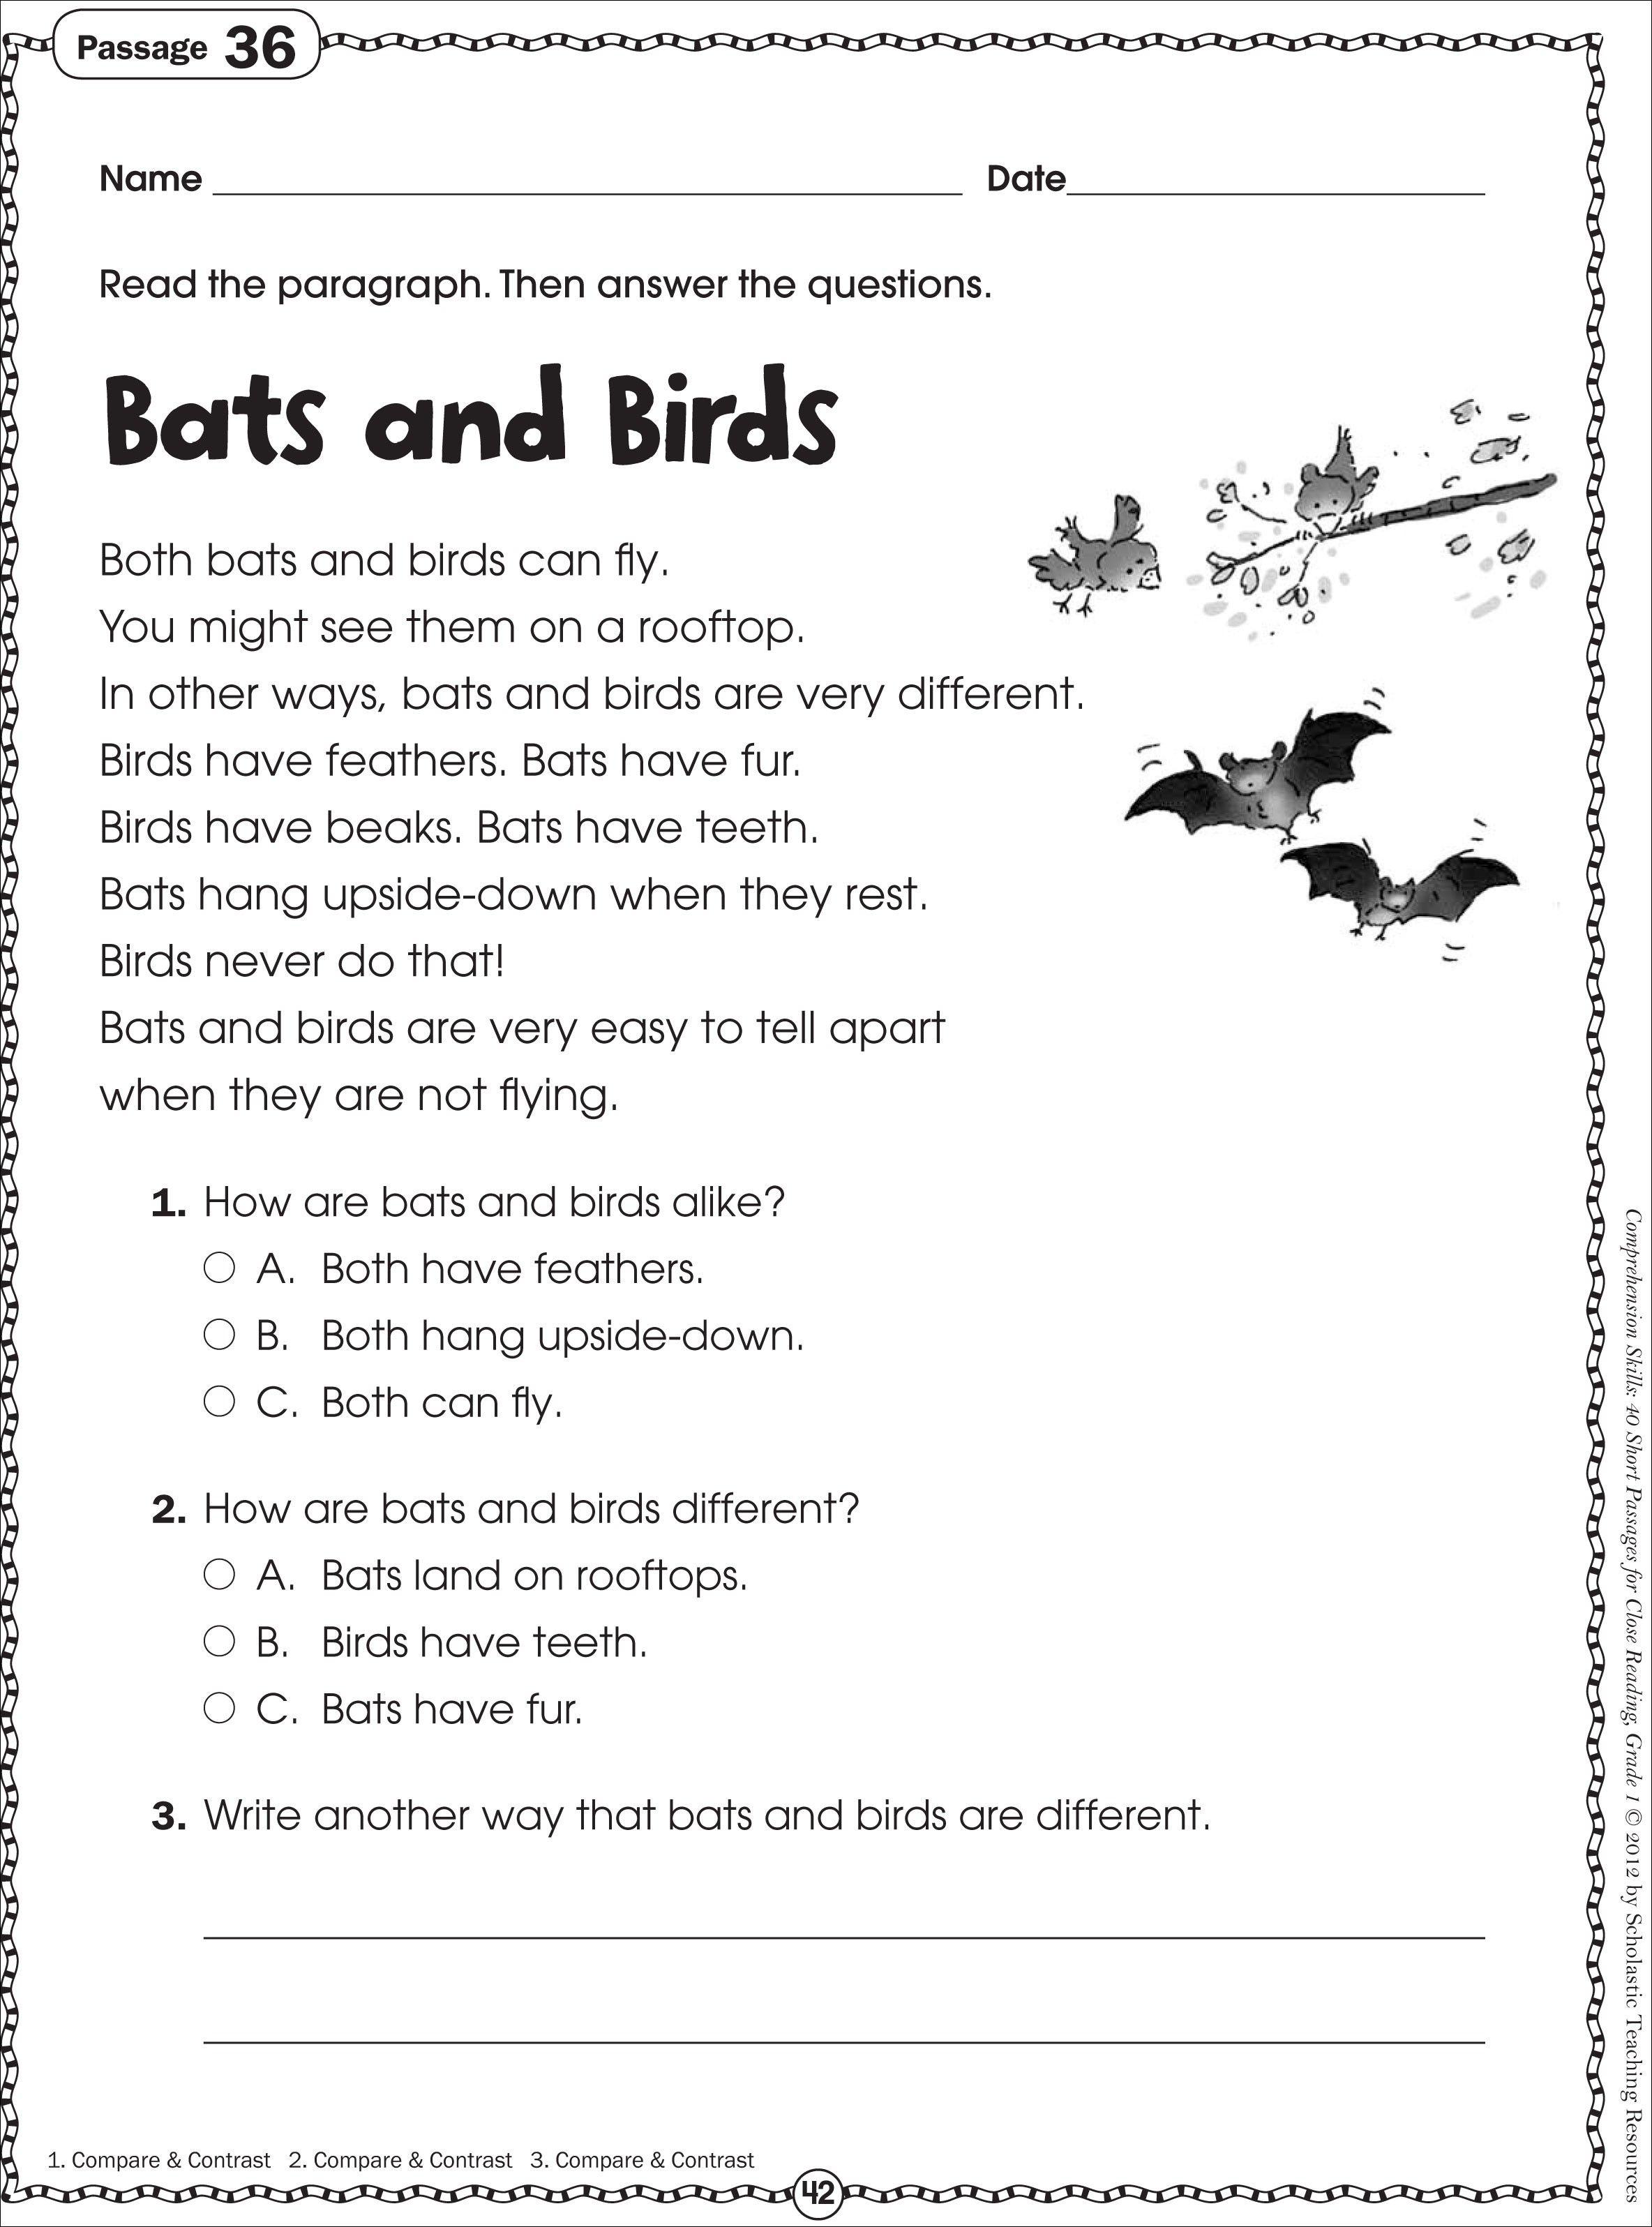 Free Printable Reading Comprehension Worksheets For Kindergarten - Free Printable Ela Worksheets